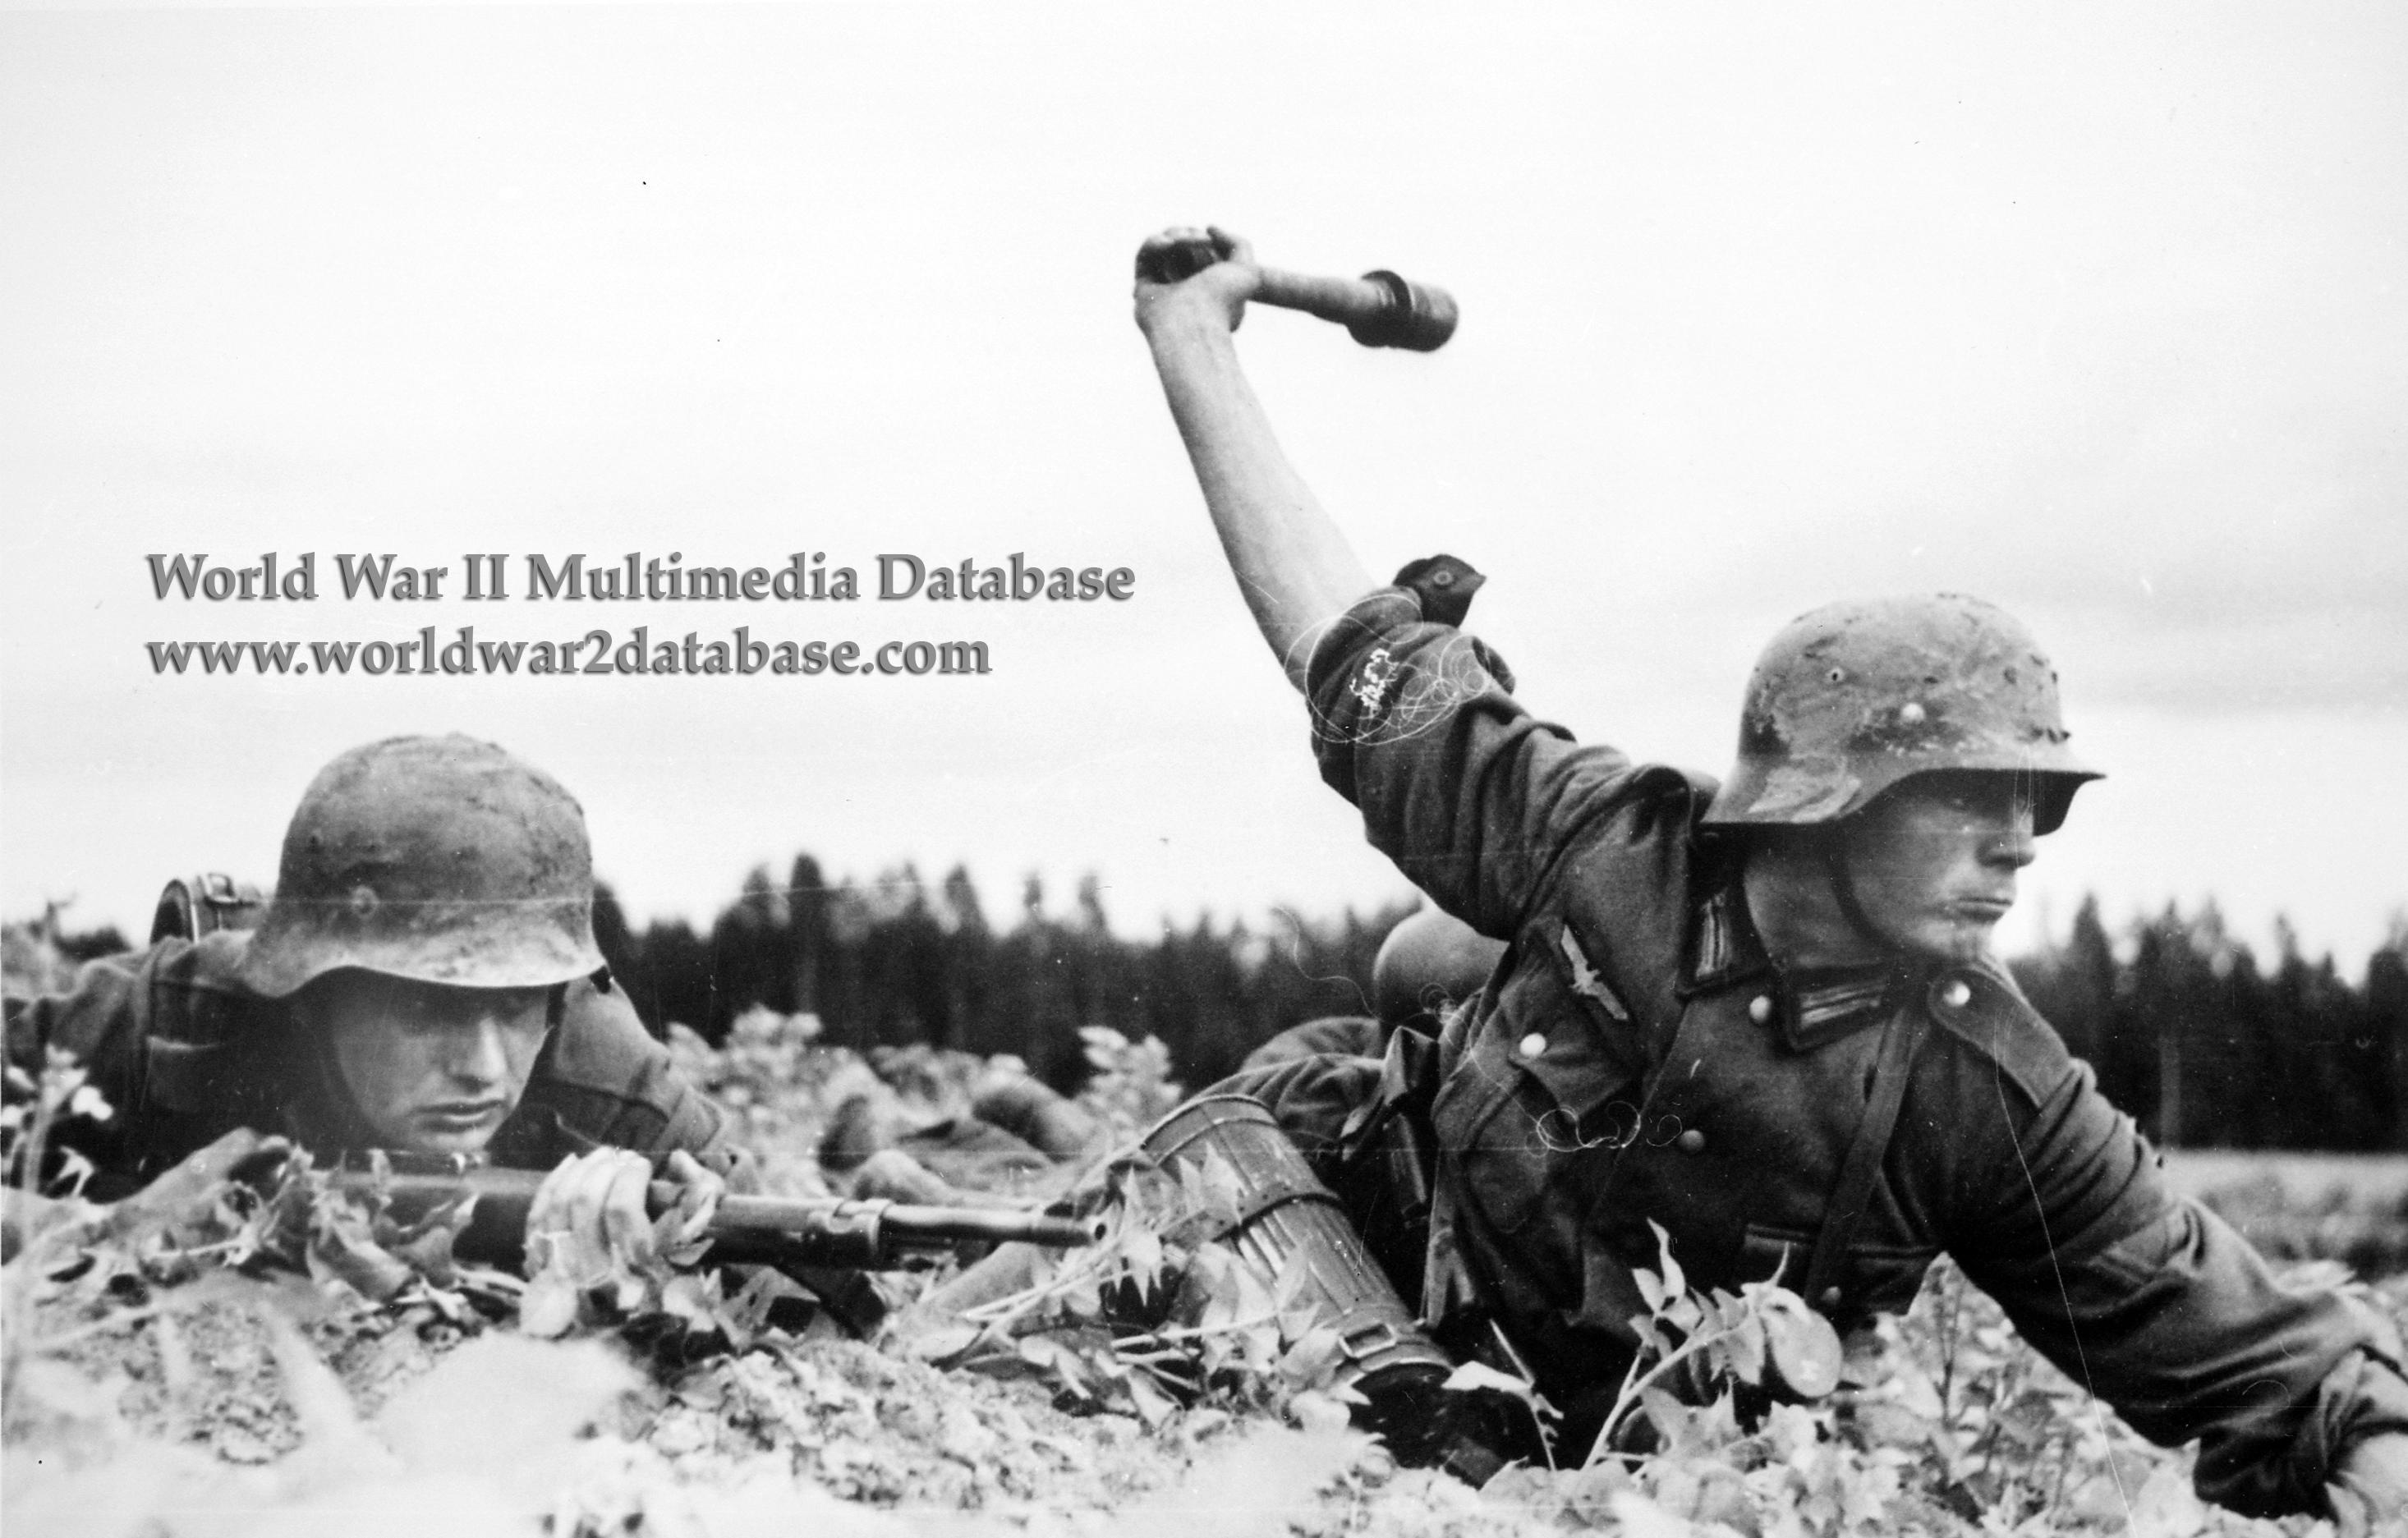 German Soldier Throws Stick Grenade | The World War II Multimedia